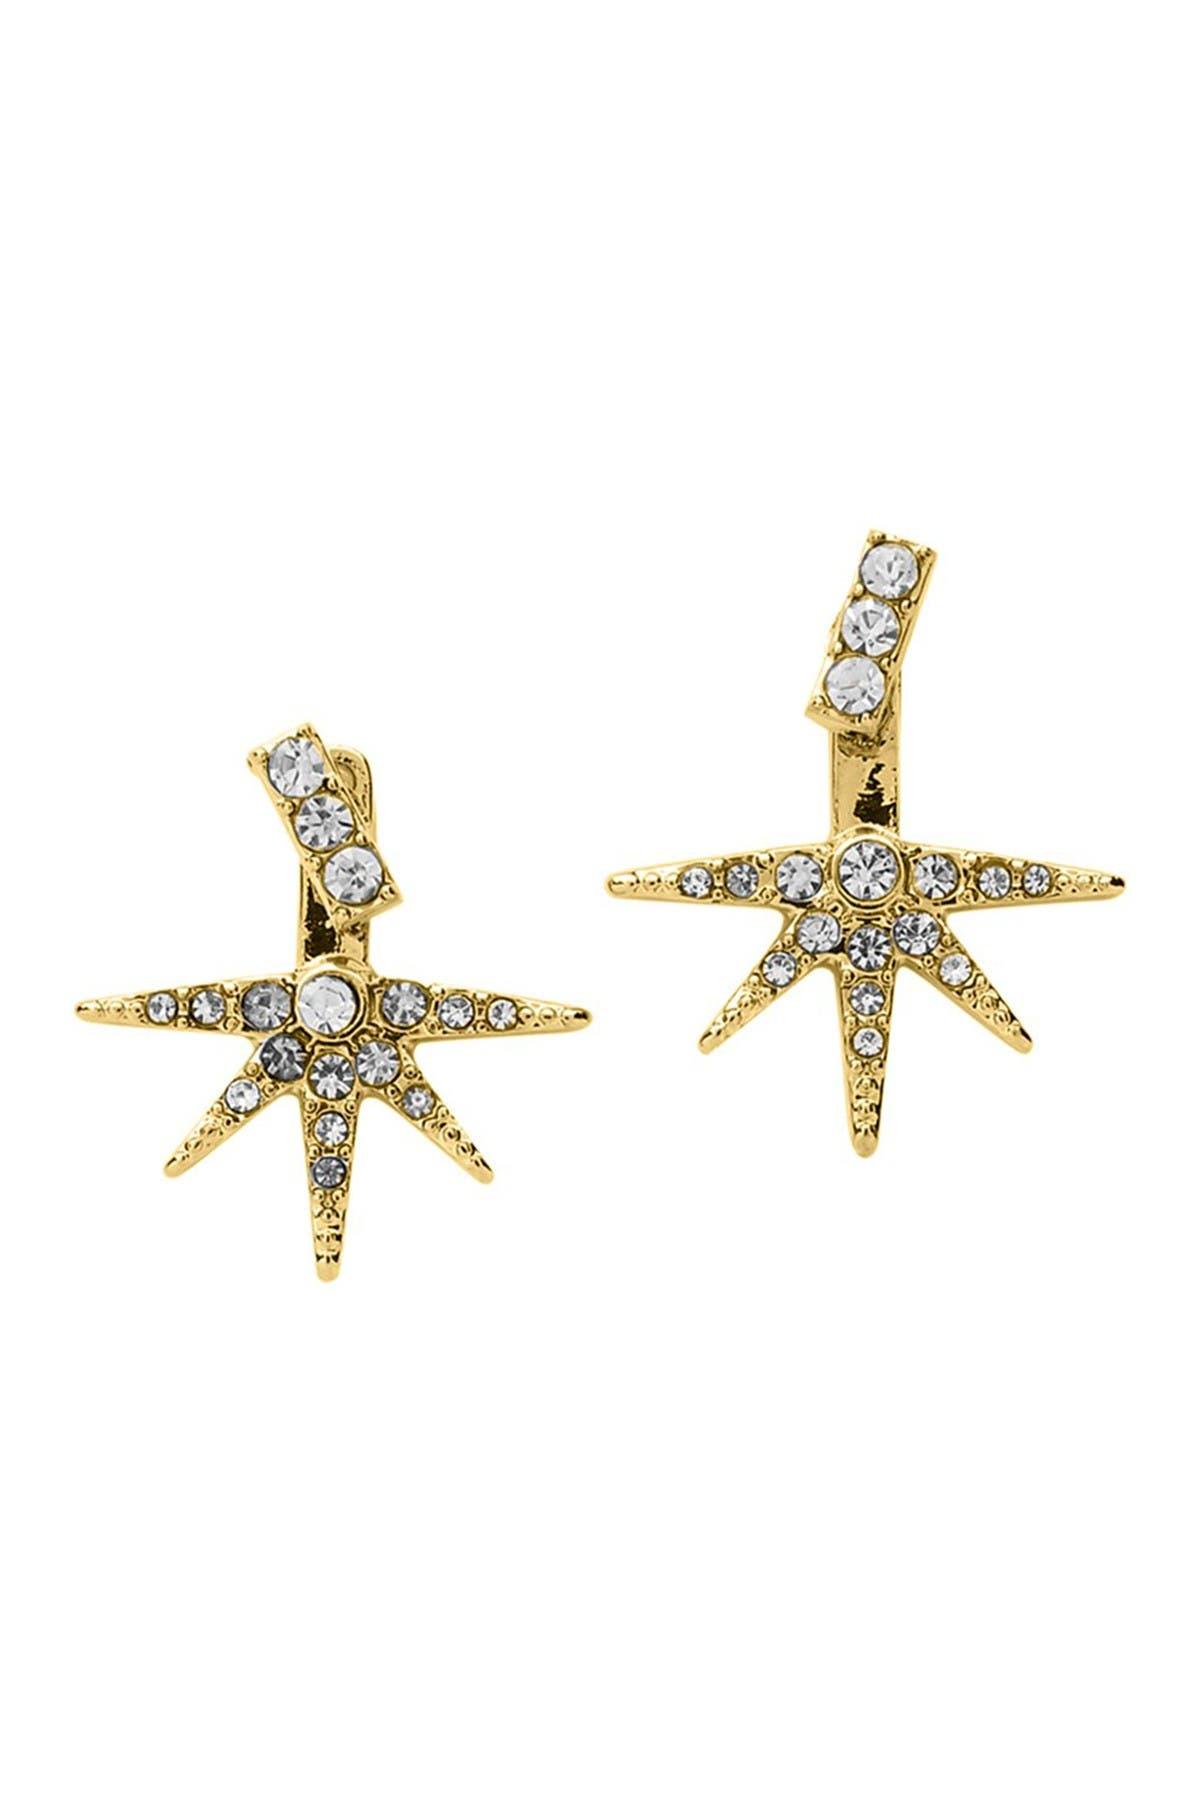 Paisley Teardrop Ear Climber Sterling Silver Earrings  Crawlers Jackets Minimalist Jewelry  Blackened Oxidized  GUGMA Women/'s Handmade